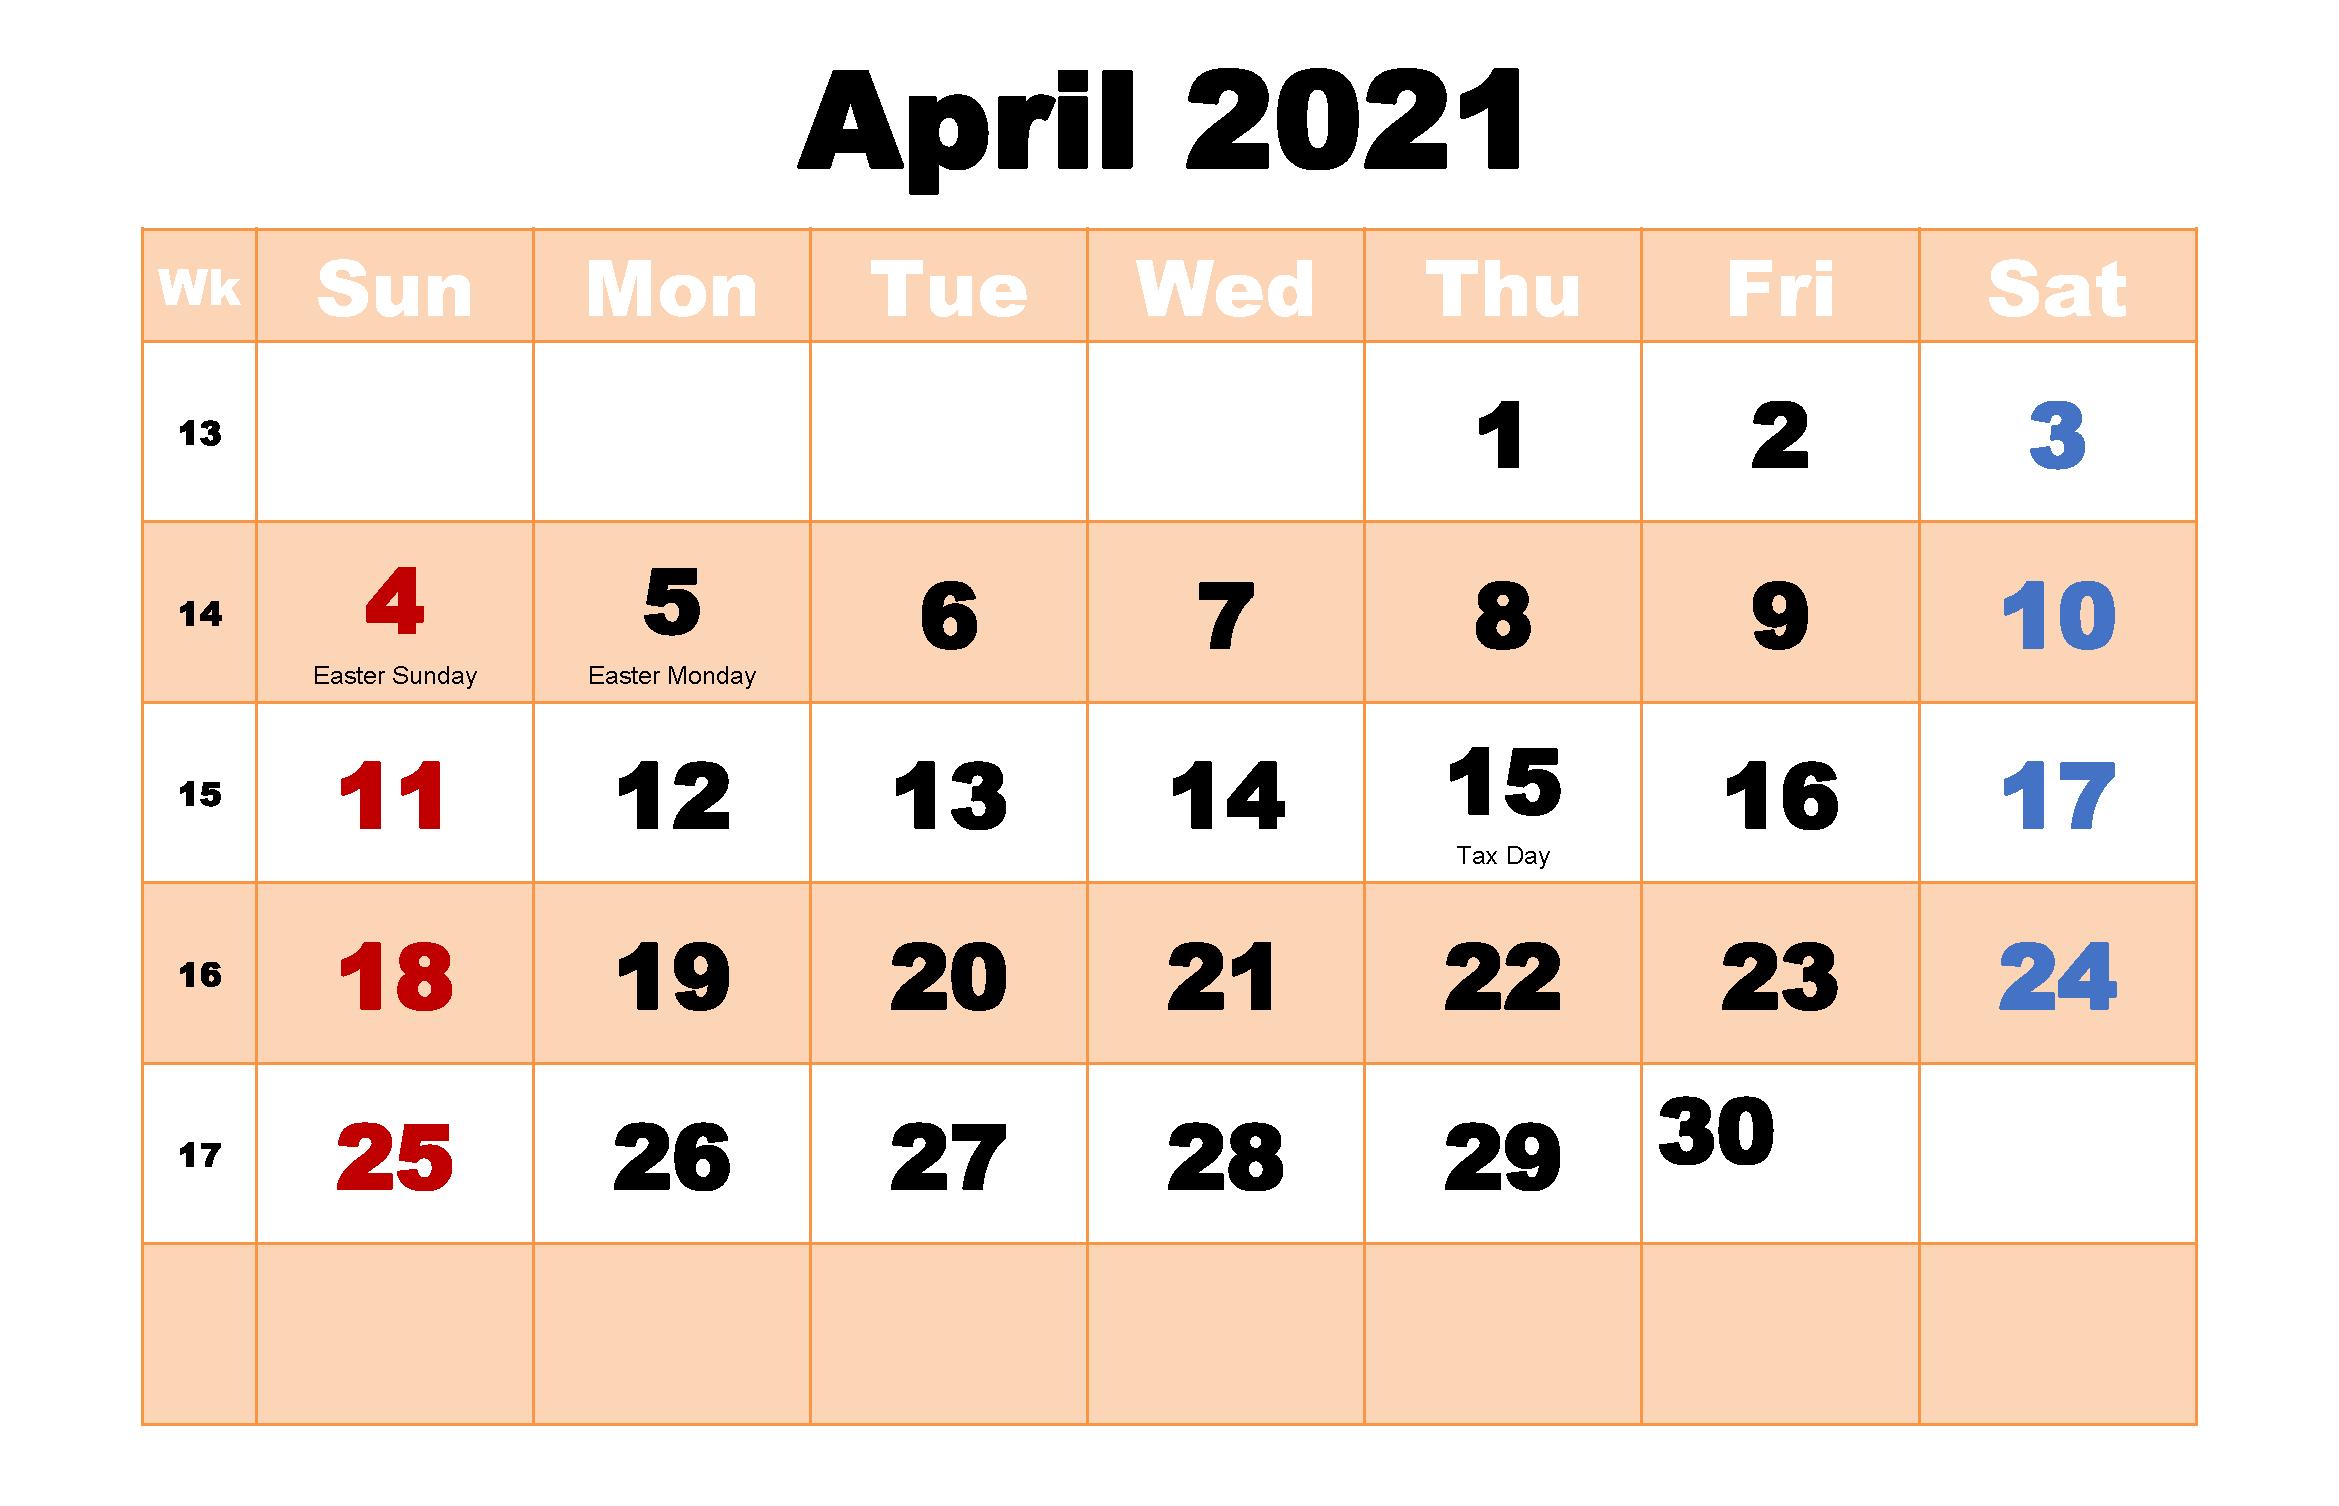 April 2021 Calendar with Holidays in 2020 | 2021 calendar ...